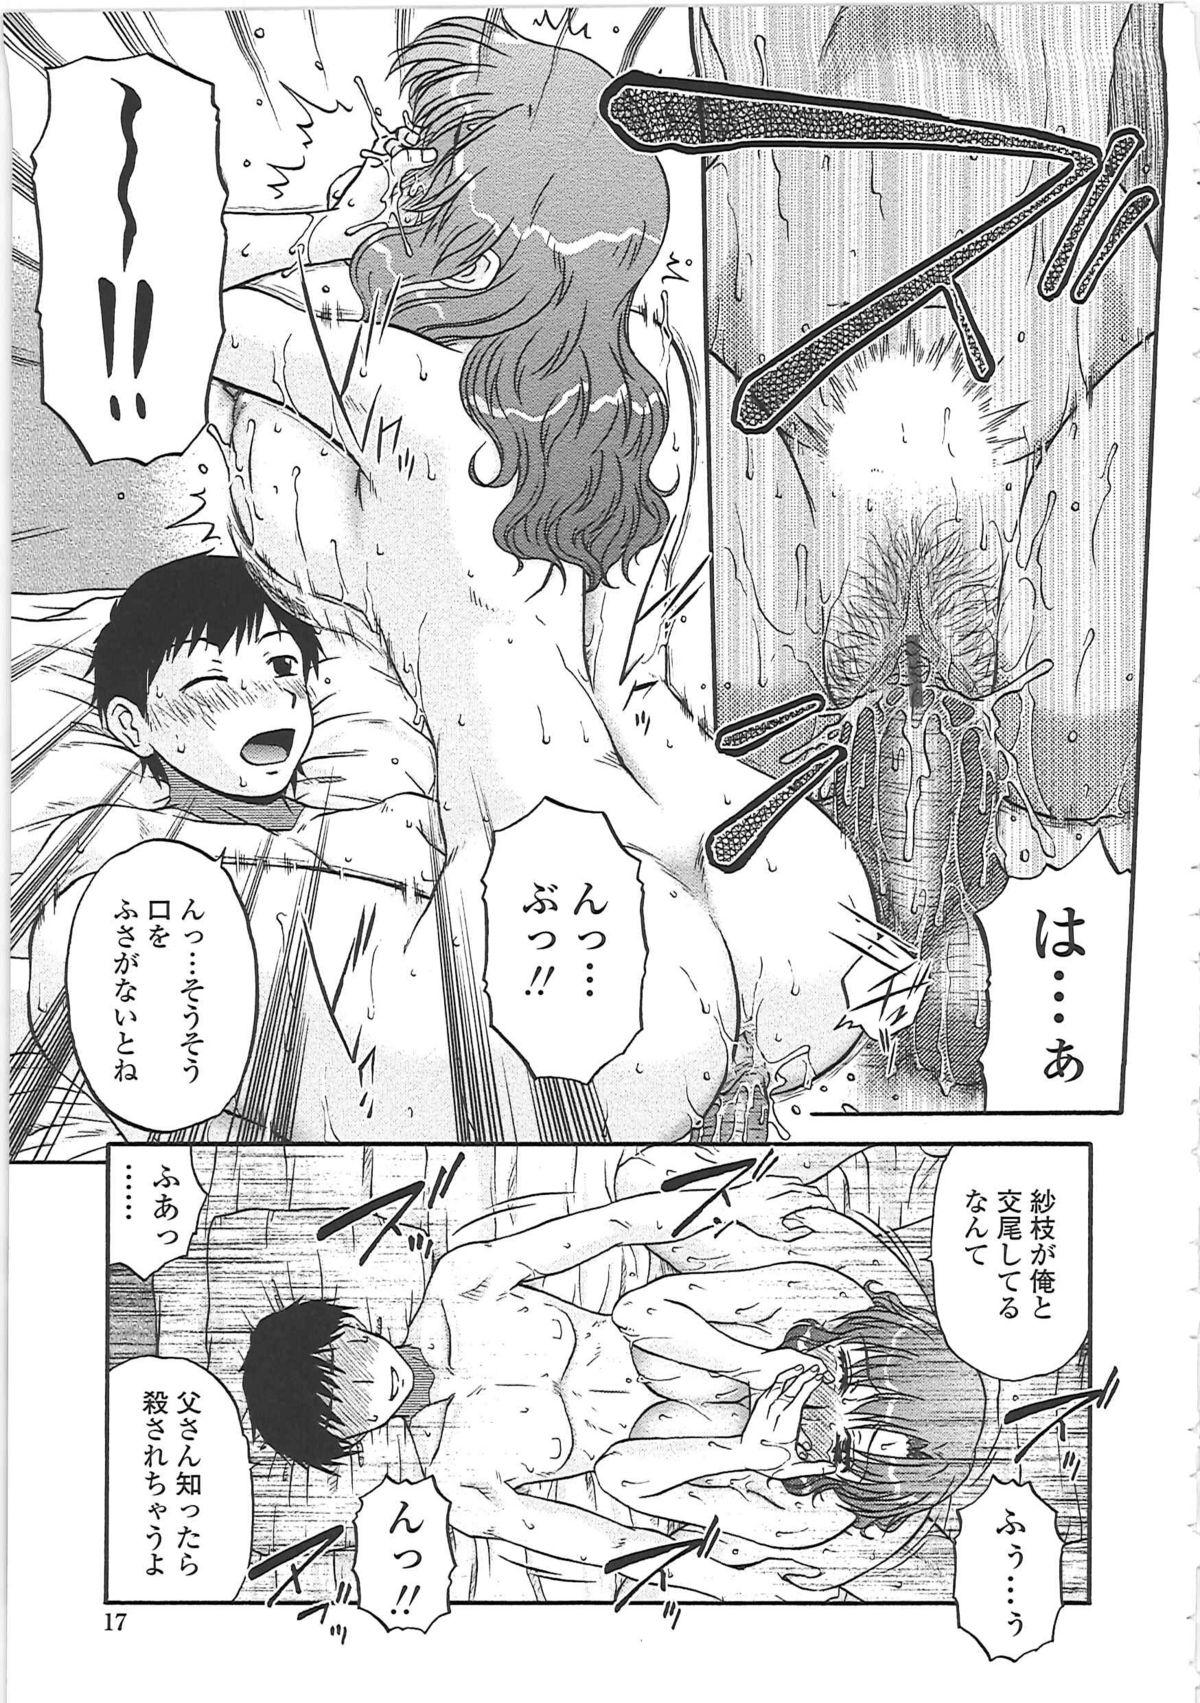 Nikuzuma Tsuushin - Erotic Wife Communication 21